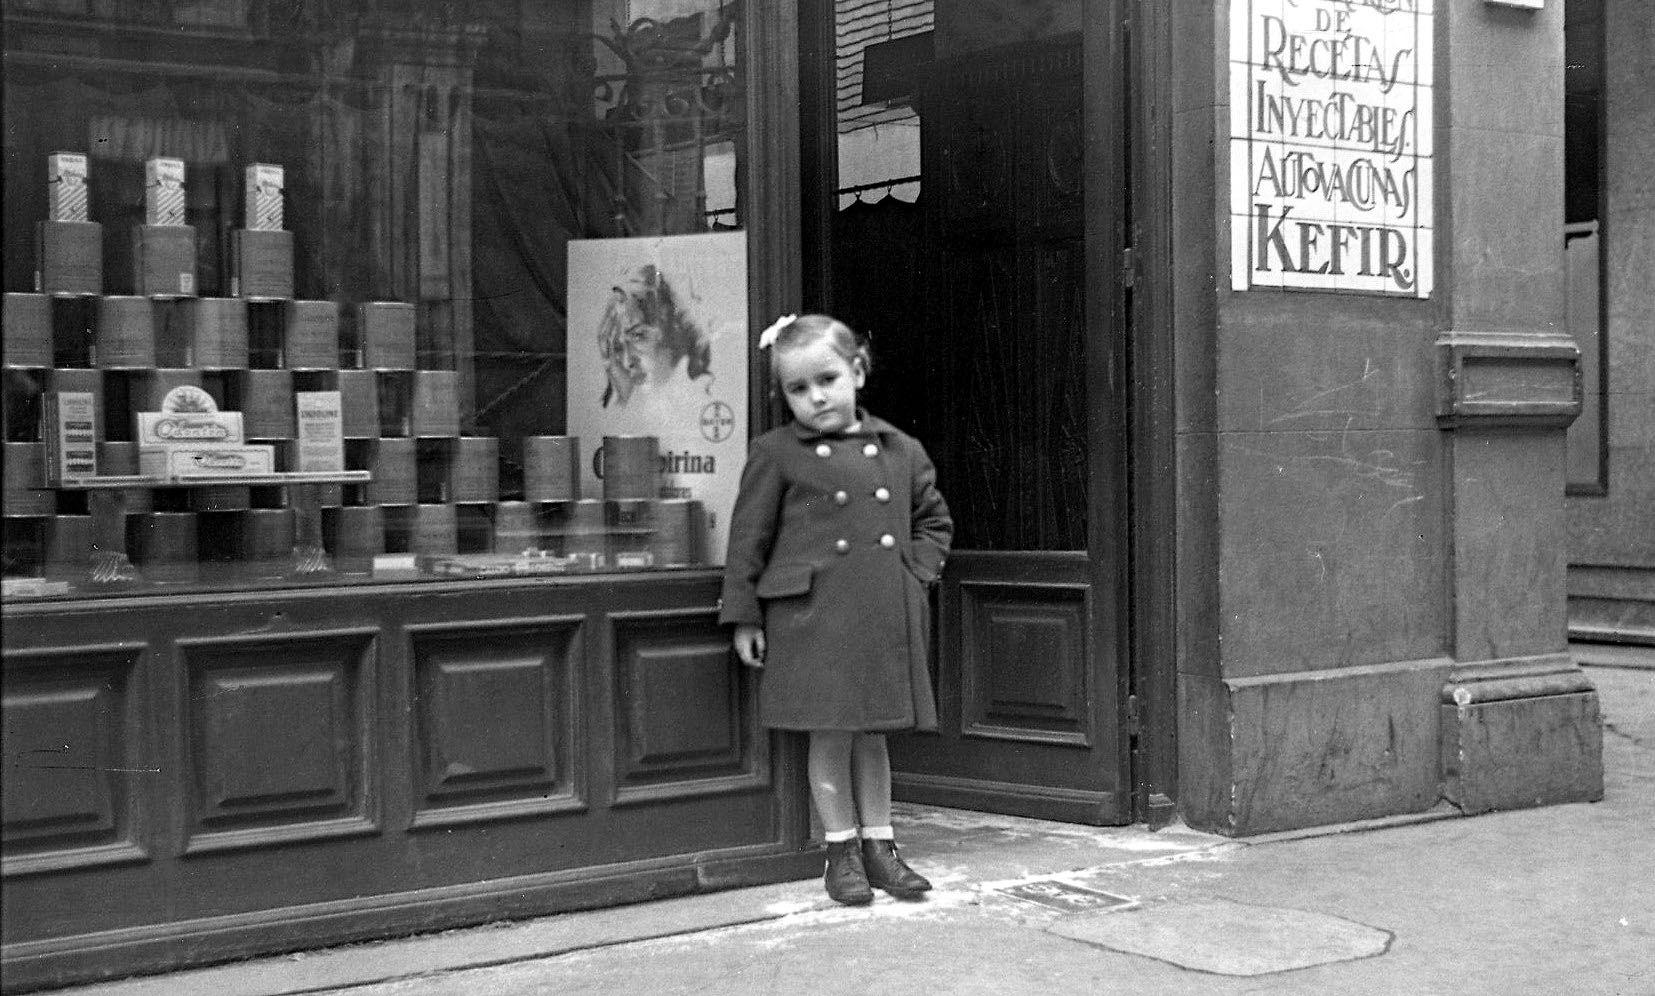 Farmacia Castillo en la calle Corrida de Gij�n-Xix�n, h. 1955.jpg